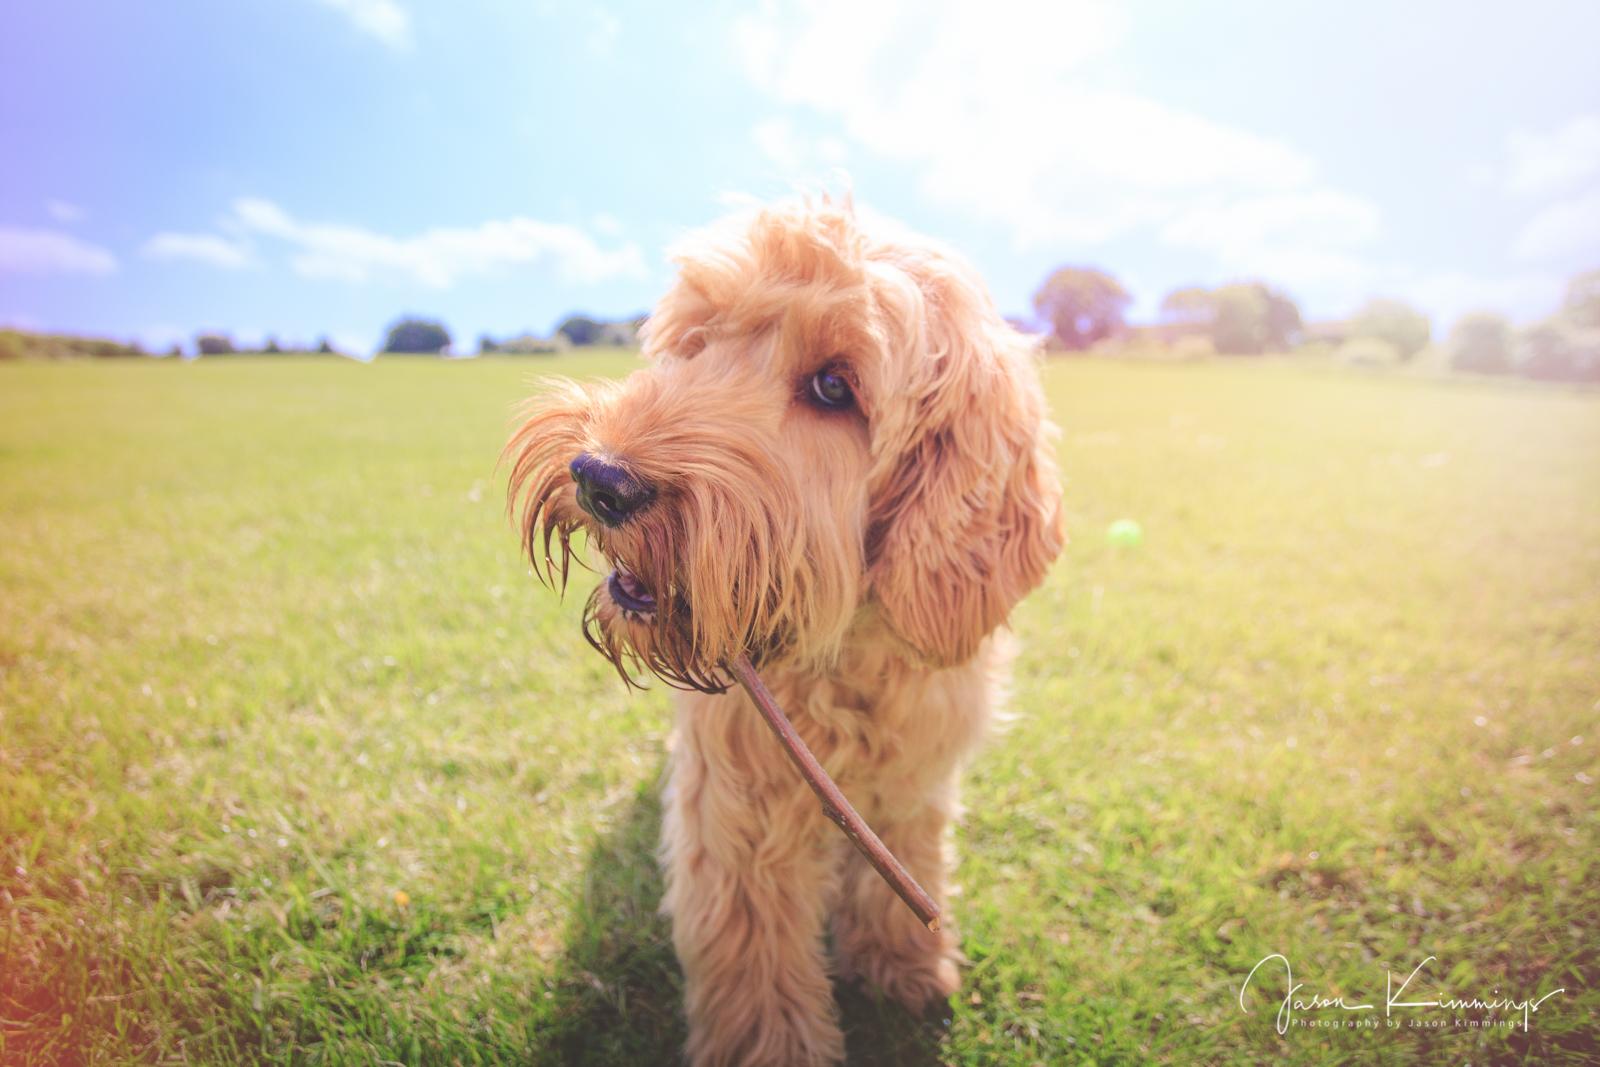 Dog-pet-photography-edinburgh-glasgow-west-lothian-3.jpg